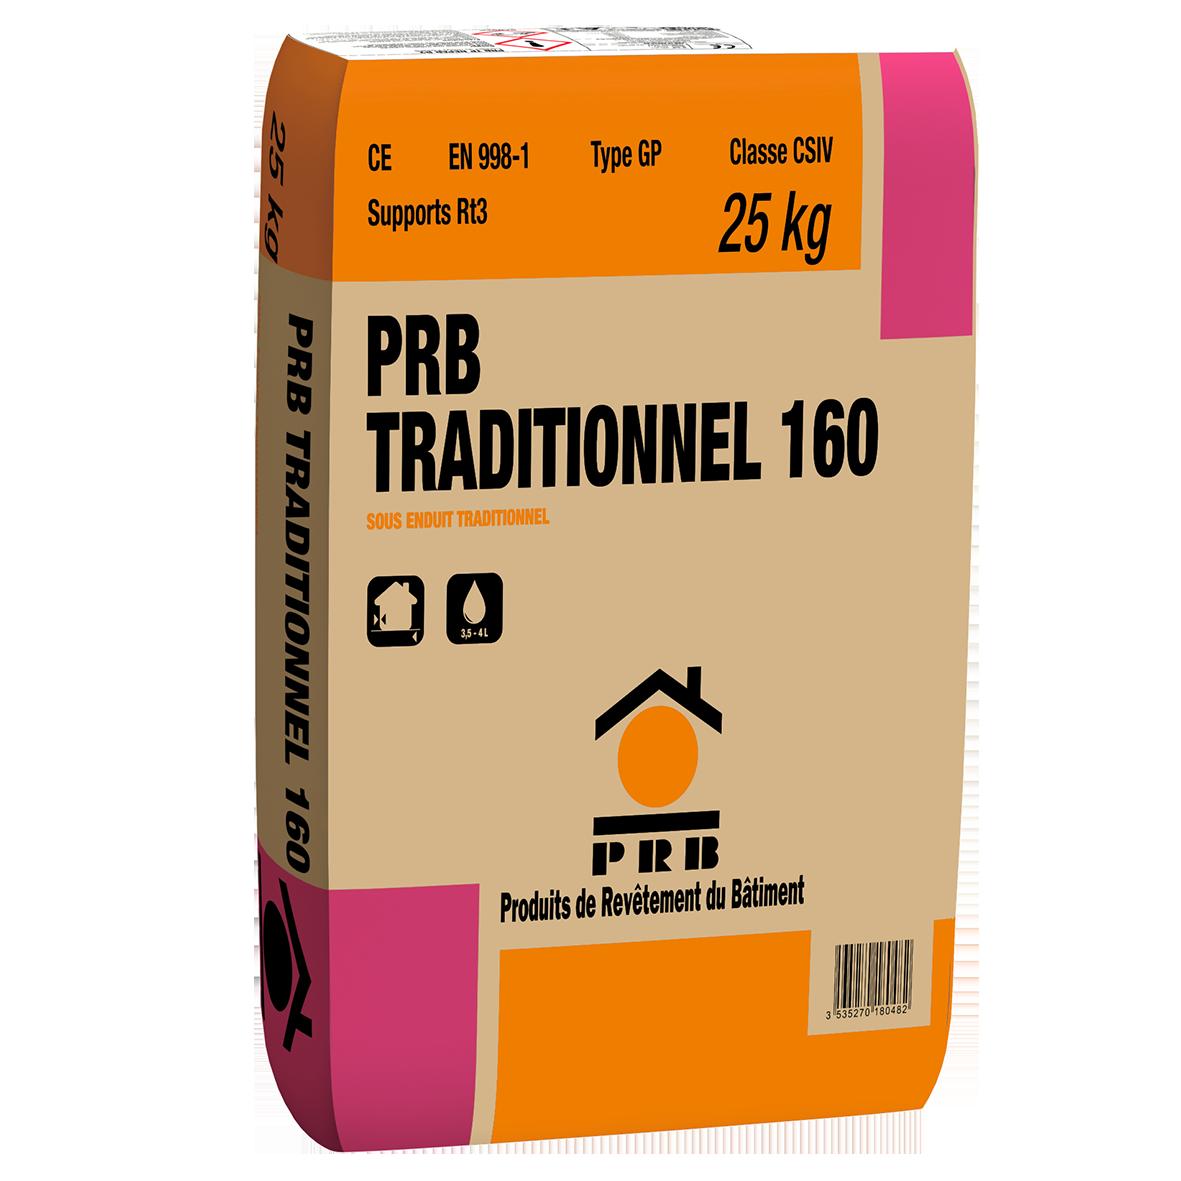 PRB TRADITIONNEL 160 25 KG